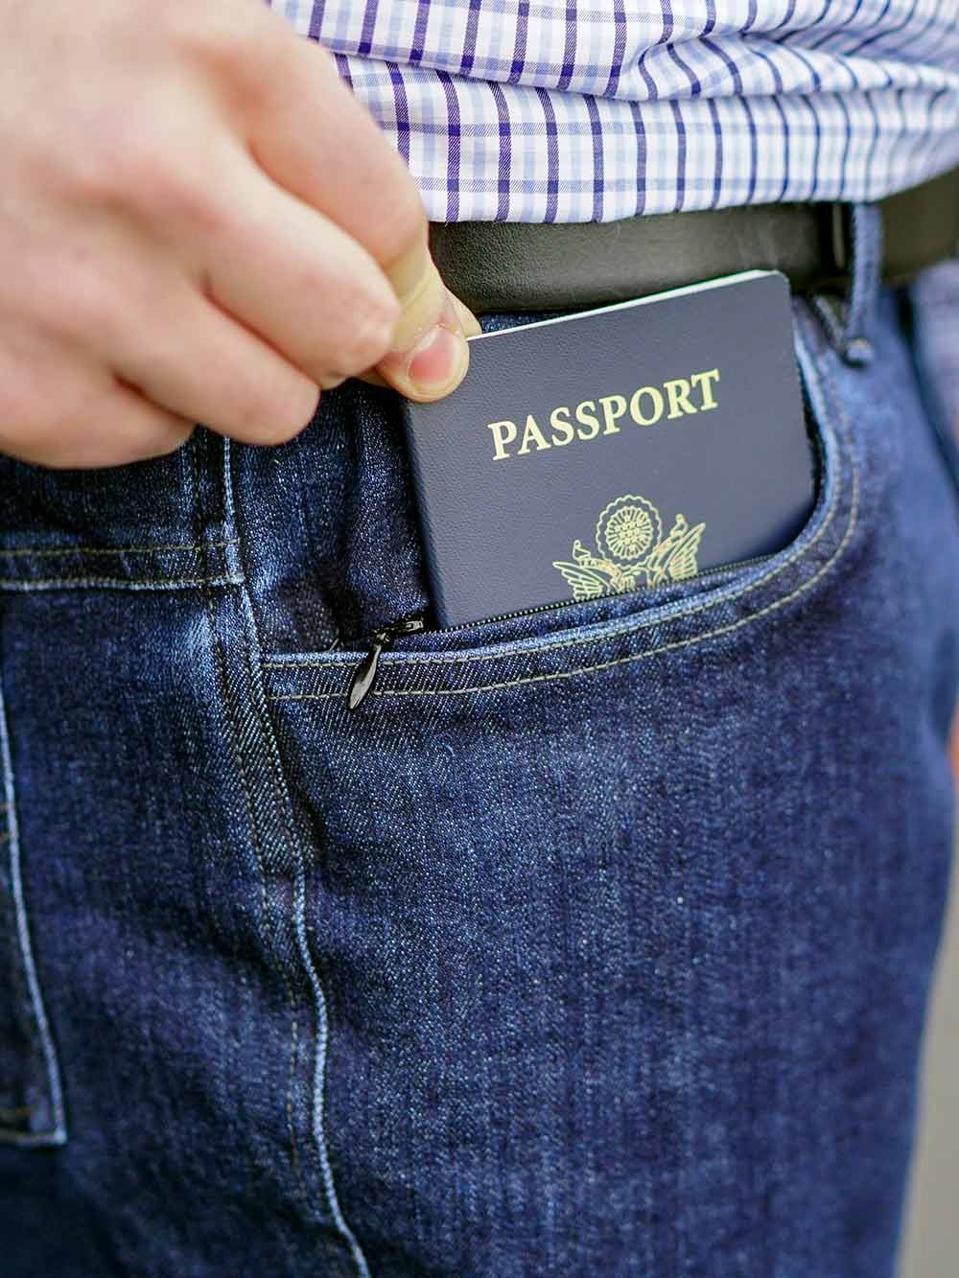 5 Travel Essentials For Your Next Trip